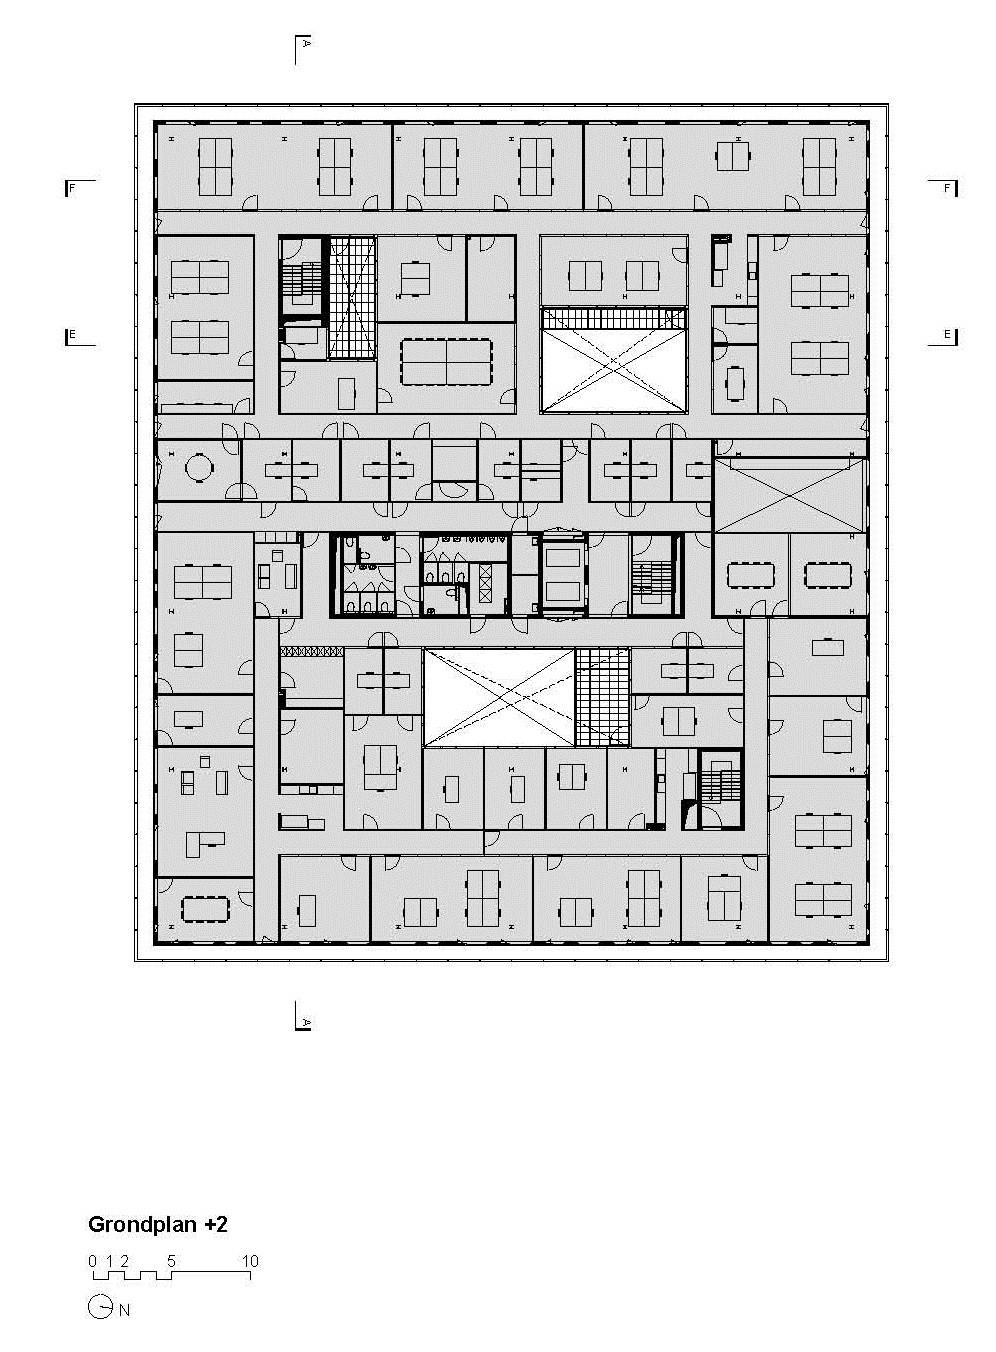 small resolution of  schematic generator wiring schematic politiecommissariaat brugge second floor plan